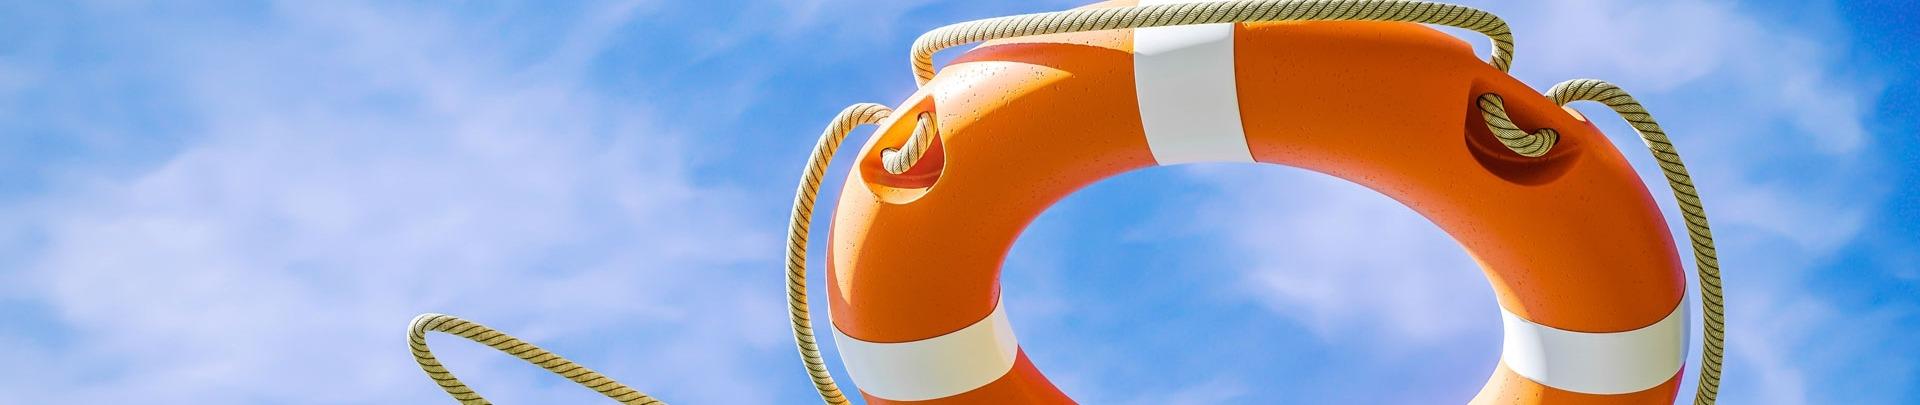 Oranje reddingsboei op wolkenachtergrond